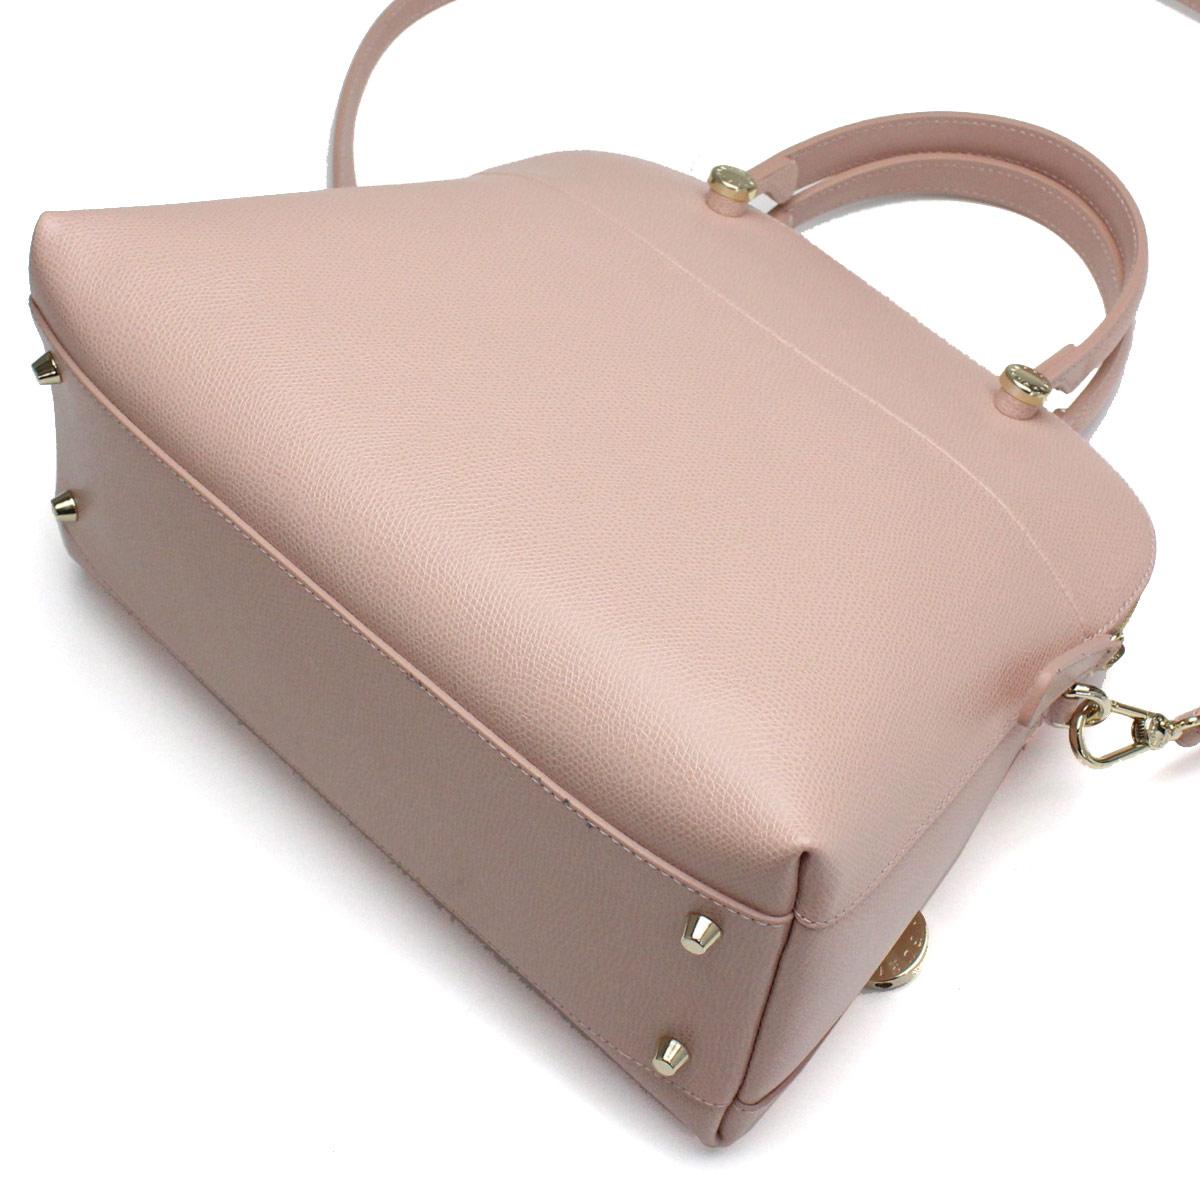 Full lah (FURLA) PIPER Piper 2WAY handbag BFK9 851236 ARE 6M0 MOONSTONE pink system